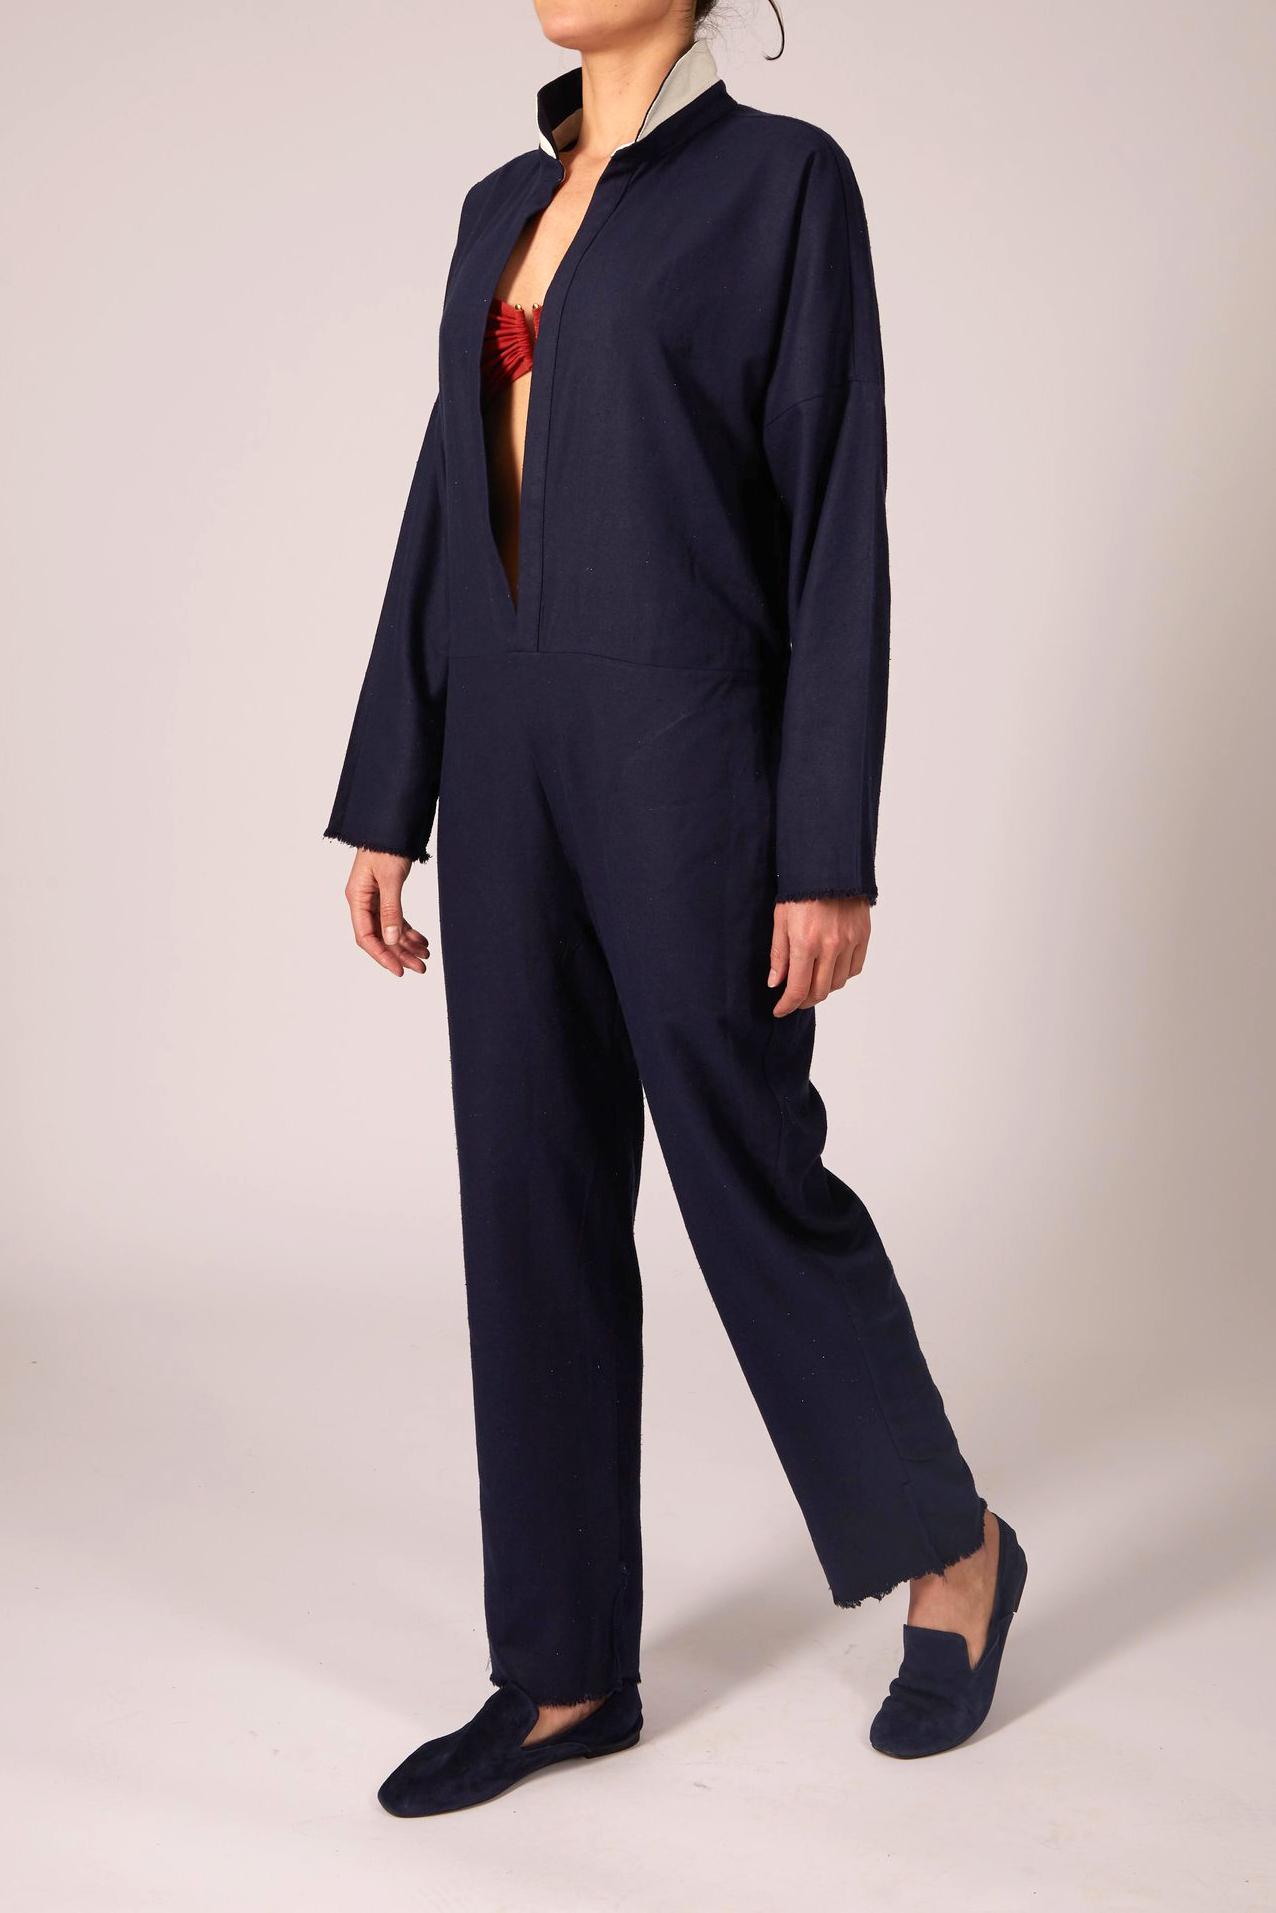 Wolcott+Robes09070048.jpg